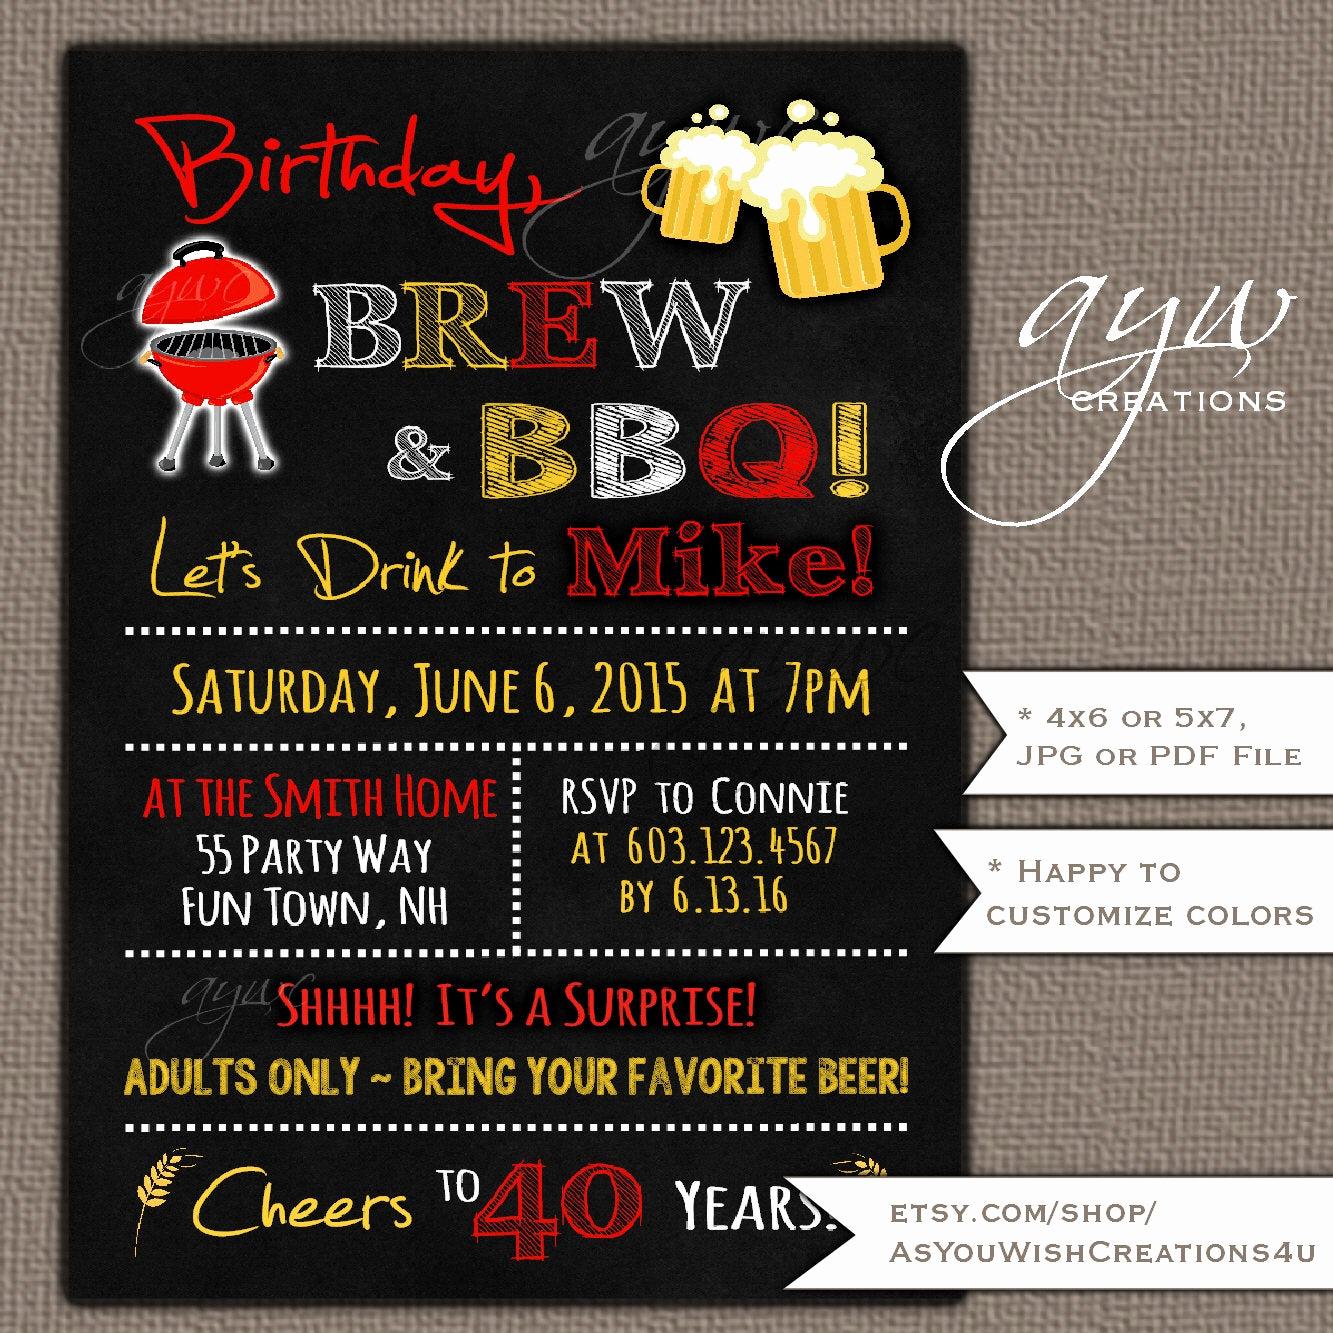 40th Birthday Invitation Wording Luxury 40th Birthday Invitation Brew and Bbq Invitation Printable